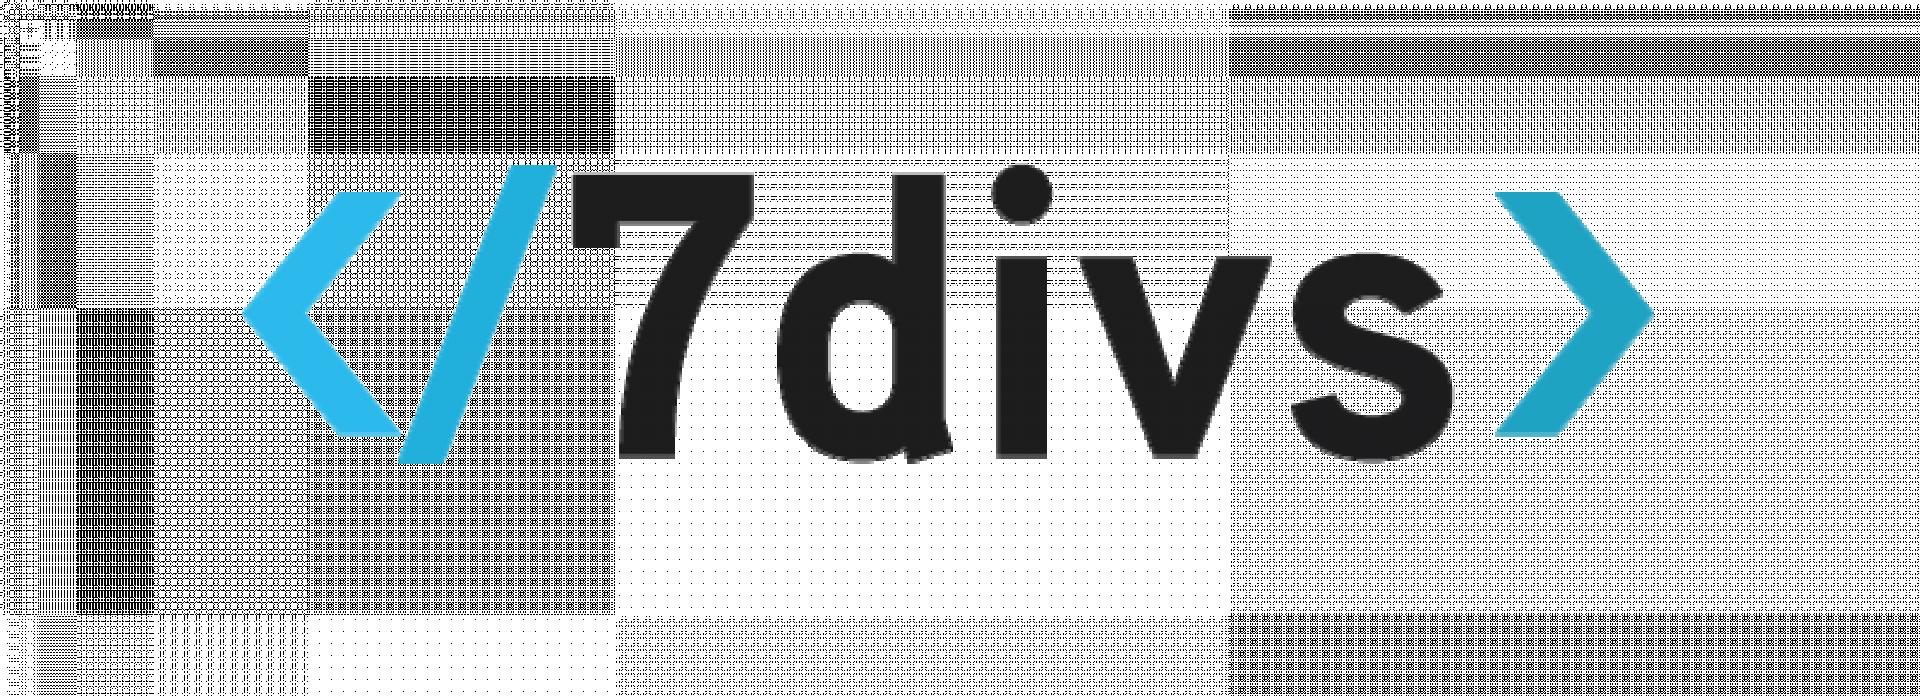 7divs logo